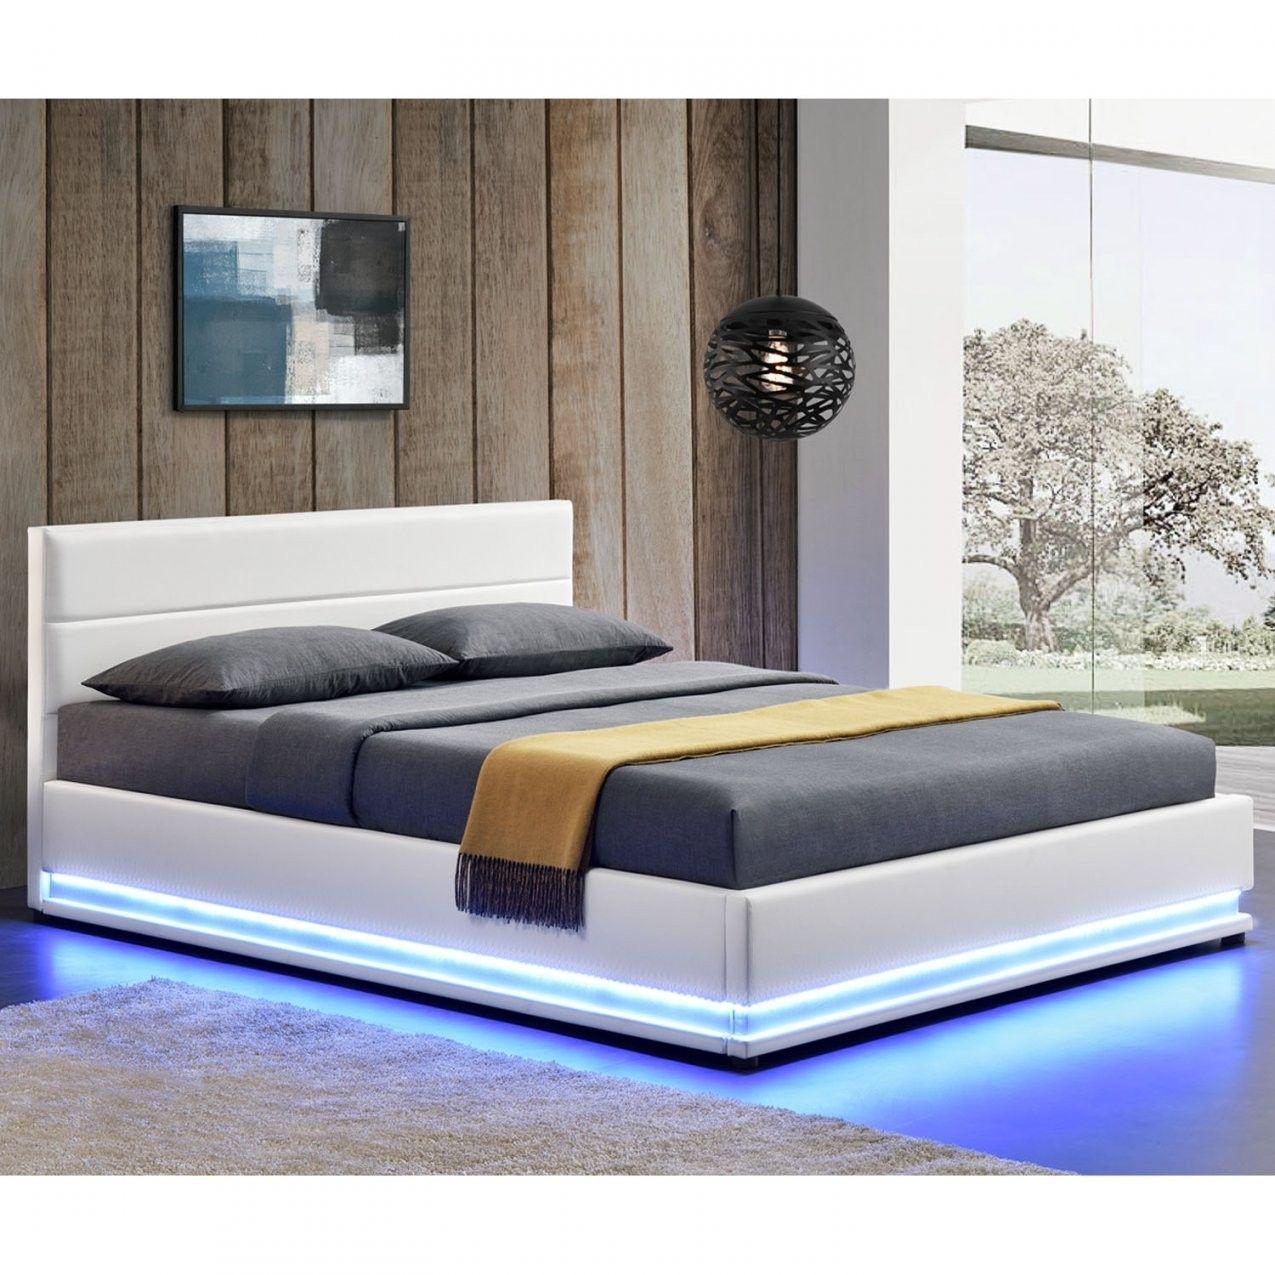 Polsterbett Led Doppelbett Bett Bettgestell Lattenrost Von Led Bett 120x200 In 2020 Wohnen Polsterbett Bett Mit Stauraum